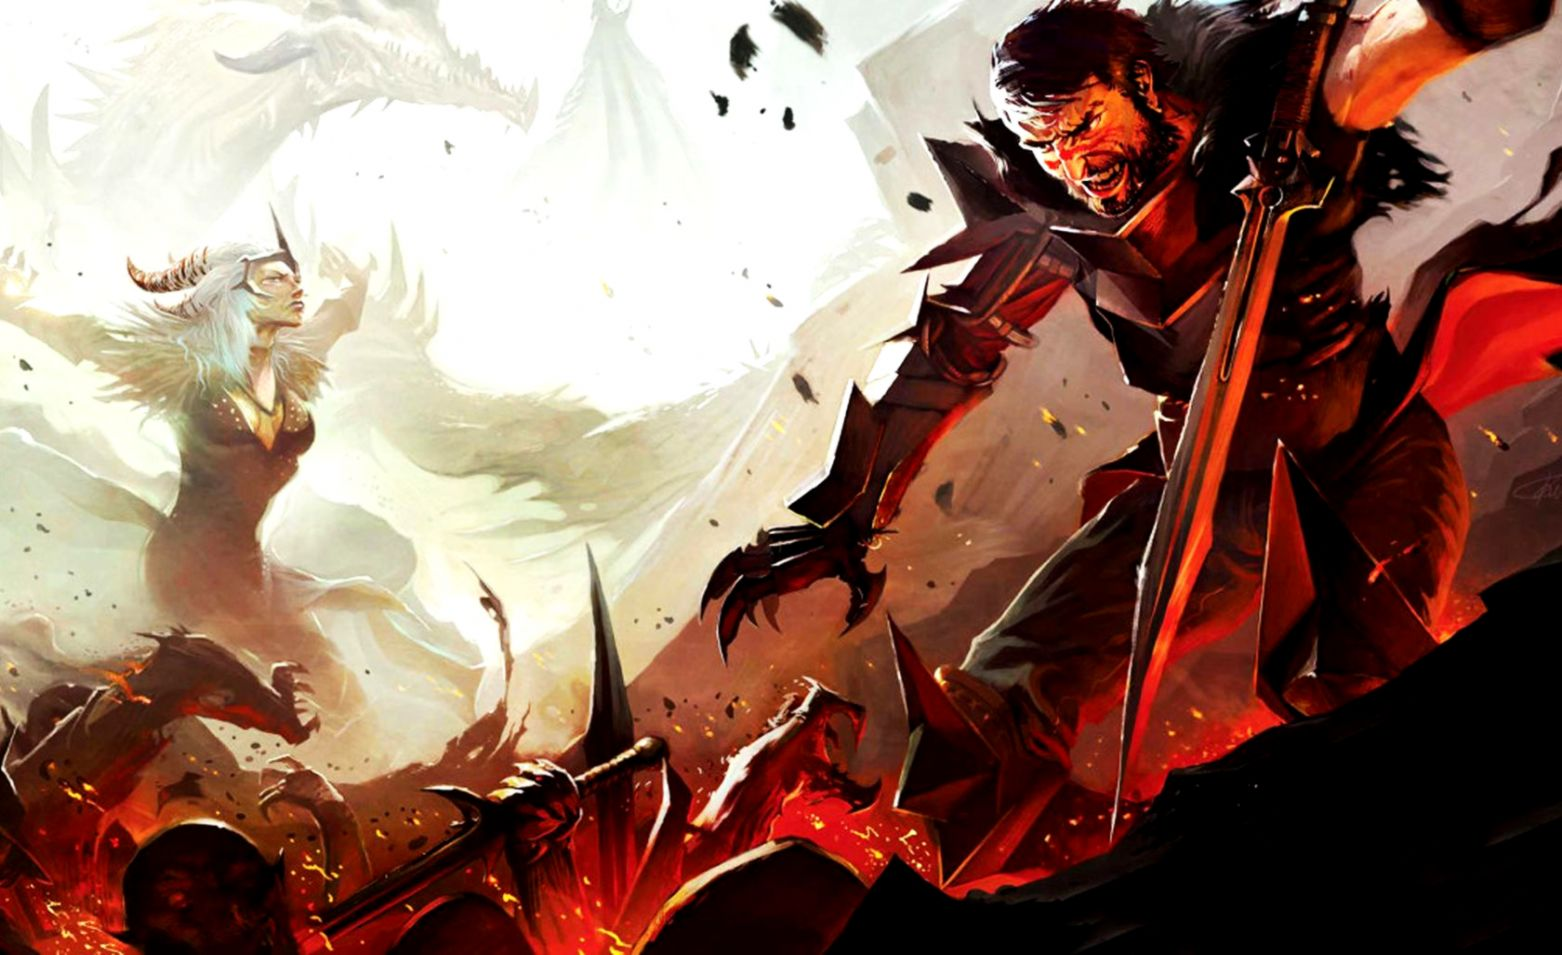 Dragon Age 3 Inquisition Wallpaper Hd Gandoss Wallpapers